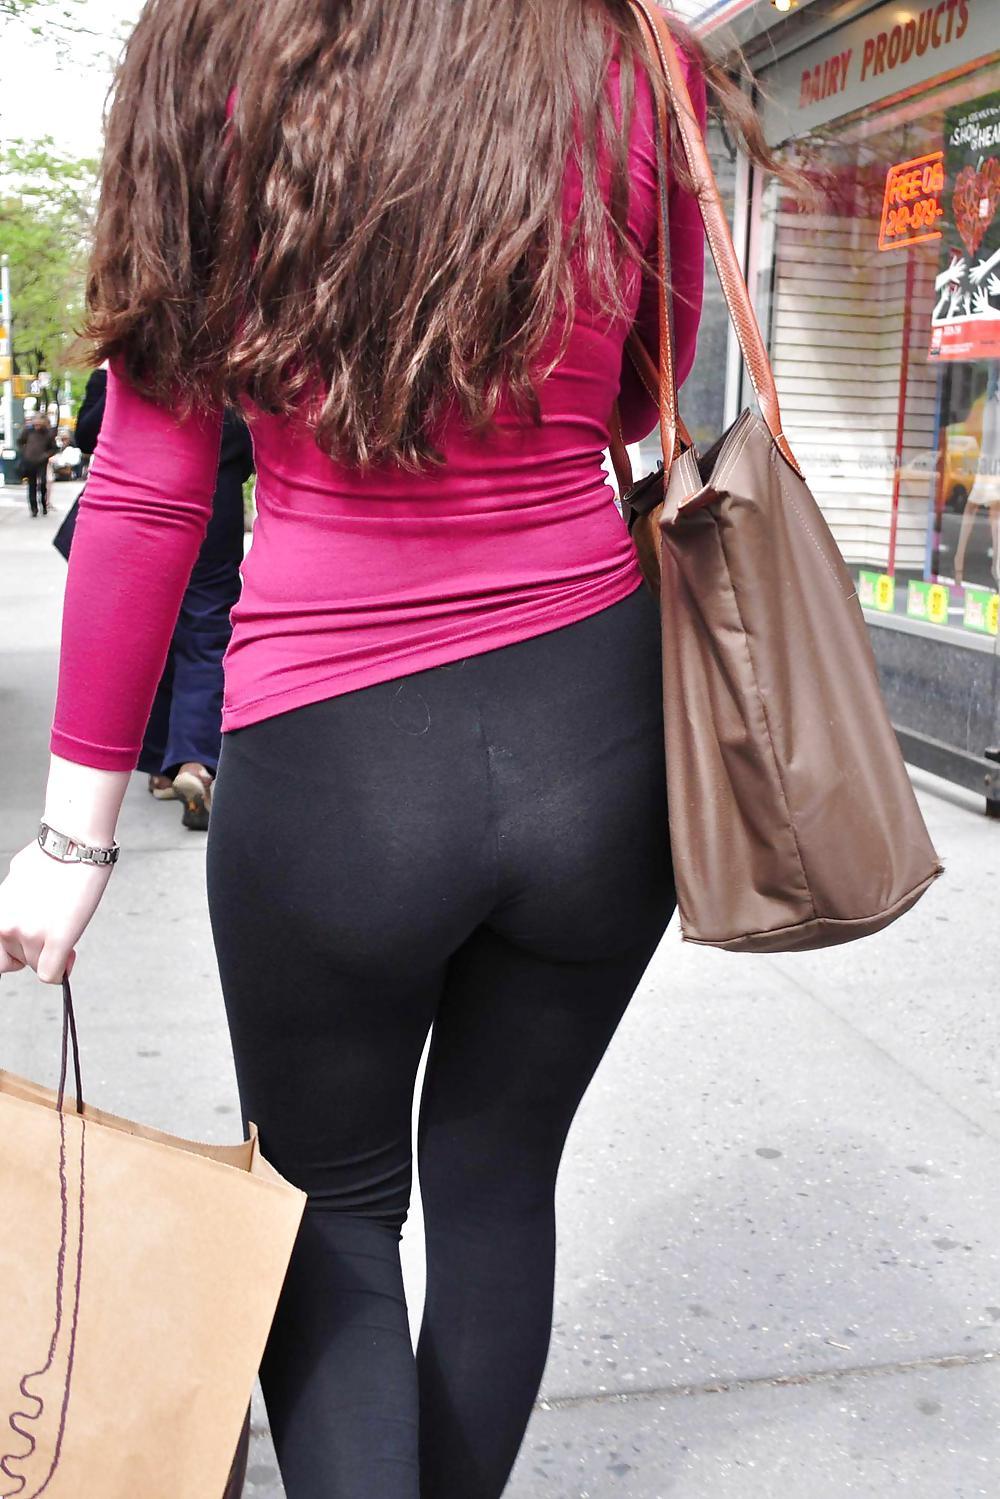 Puta falda corta - 2 part 4